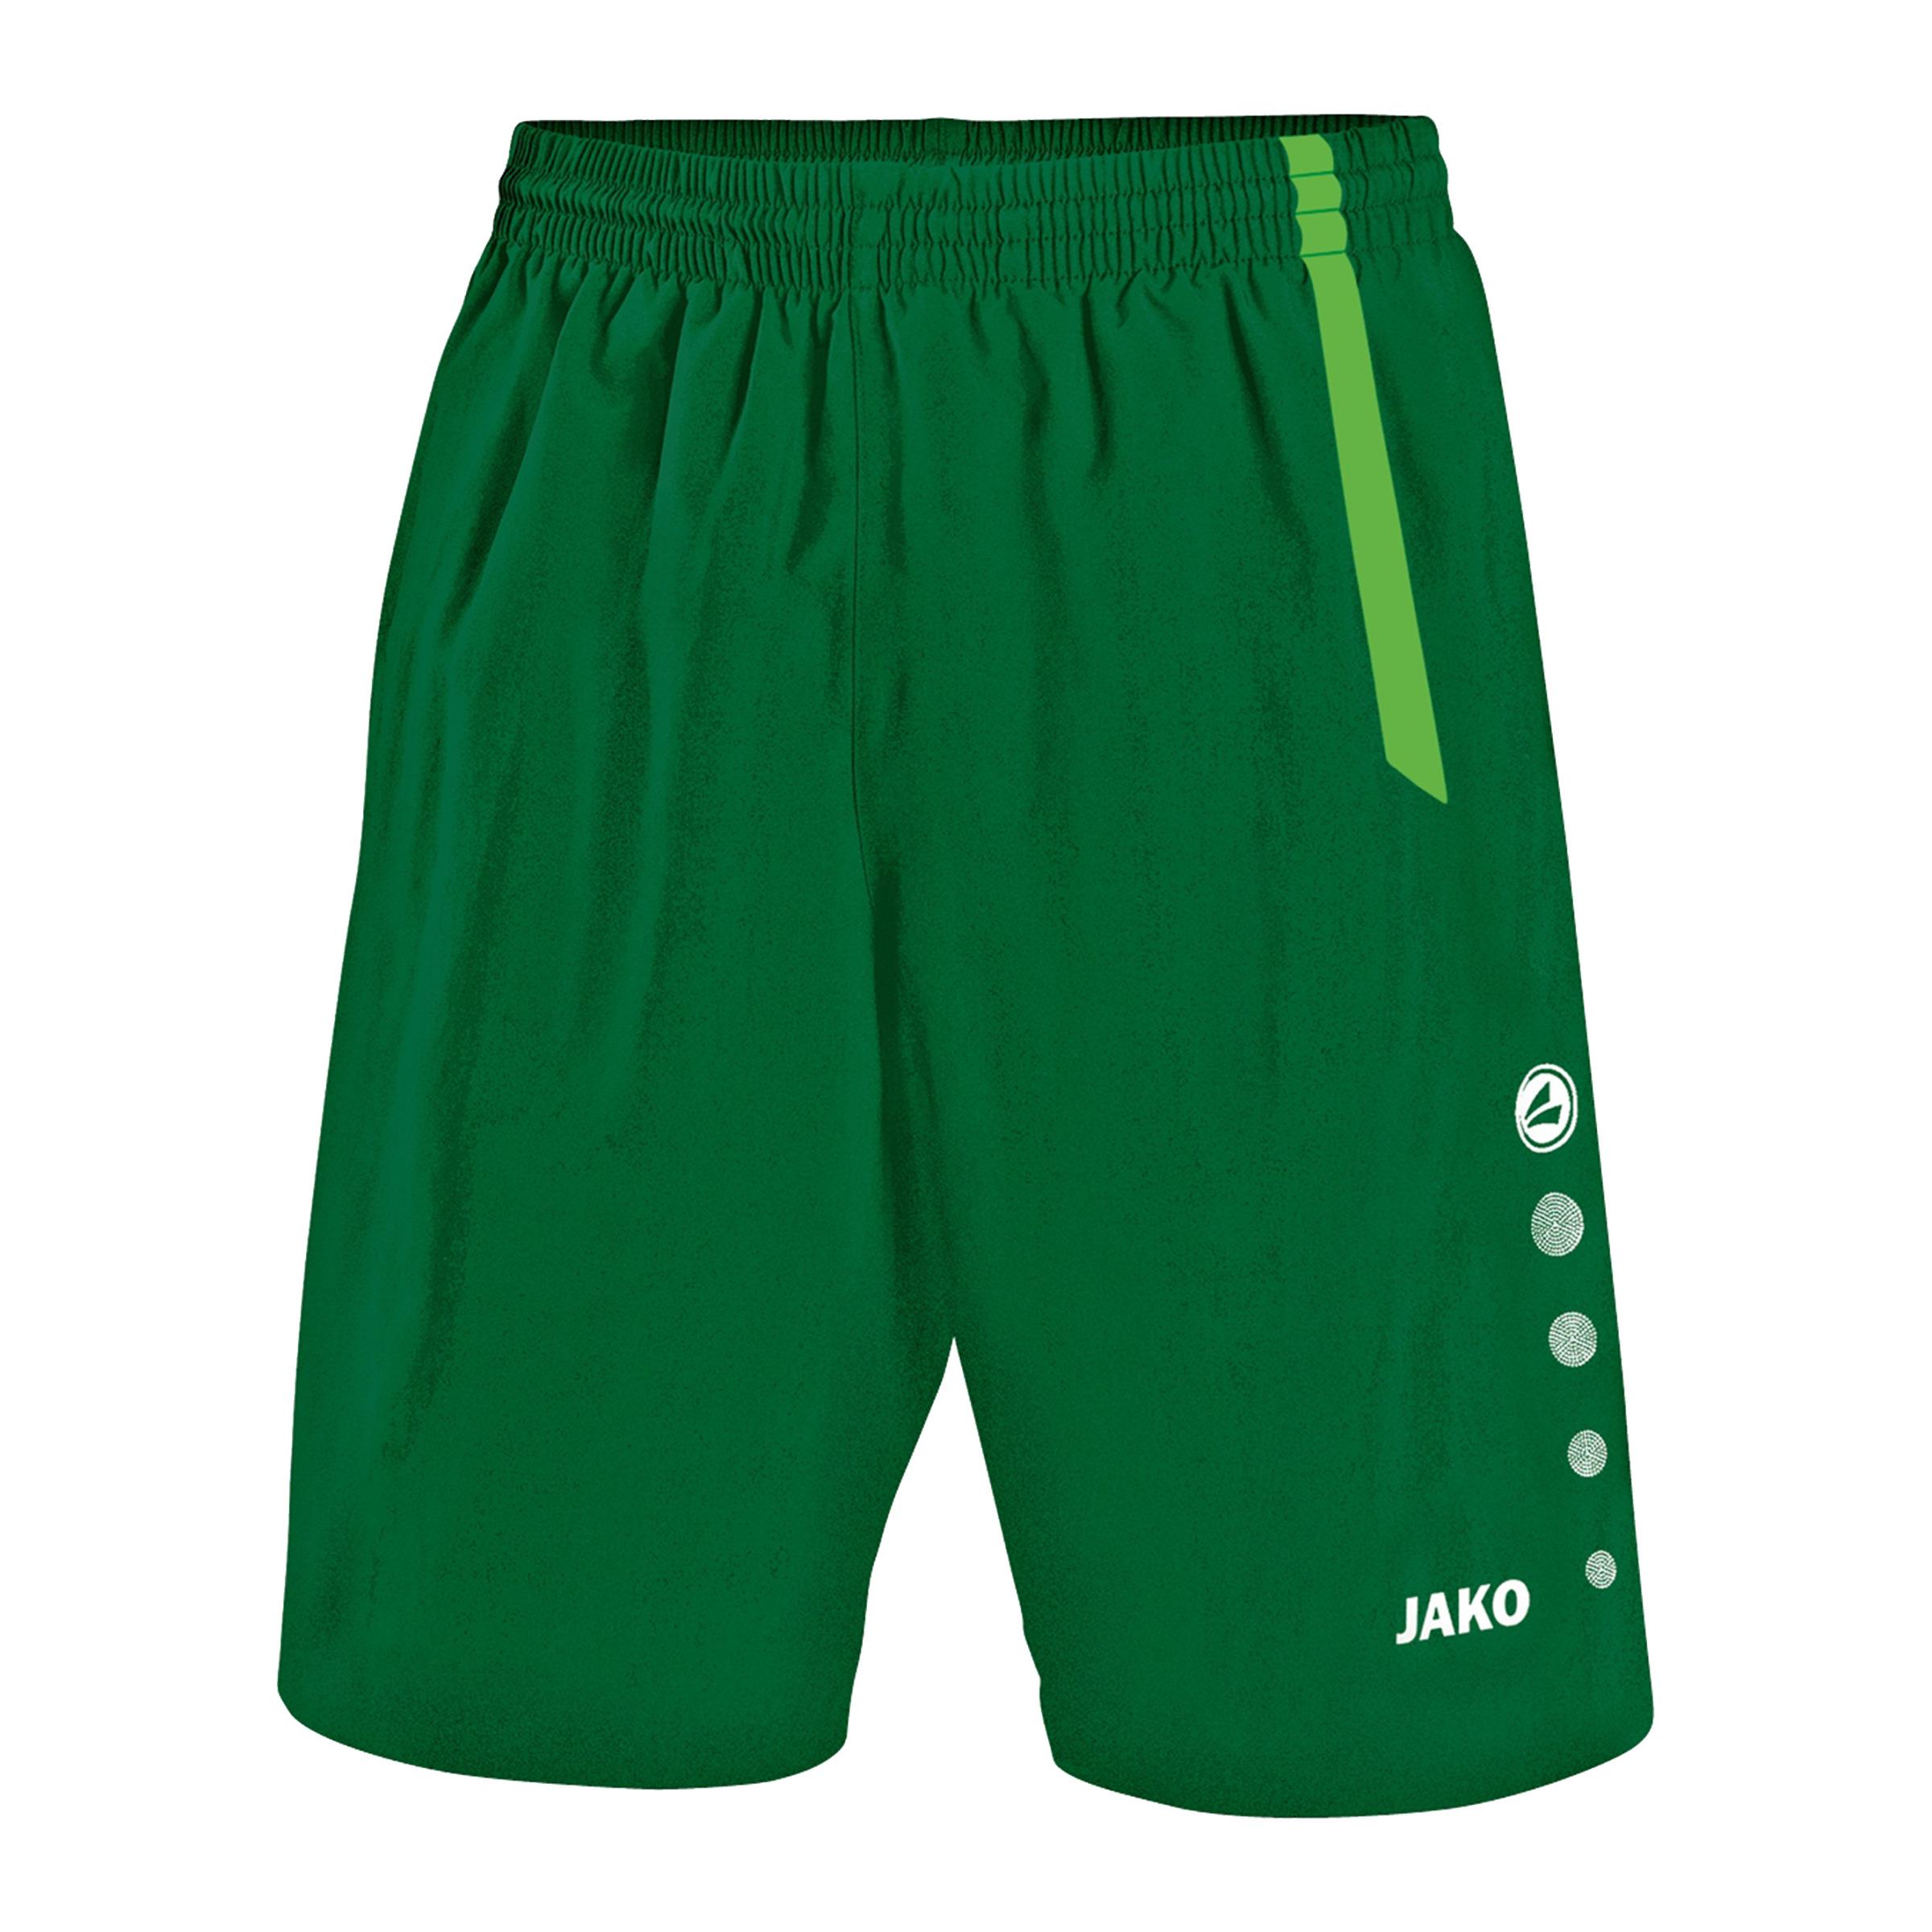 Jako Turin Sporthose ohne Innenslip Kids Grün F66 | eBay